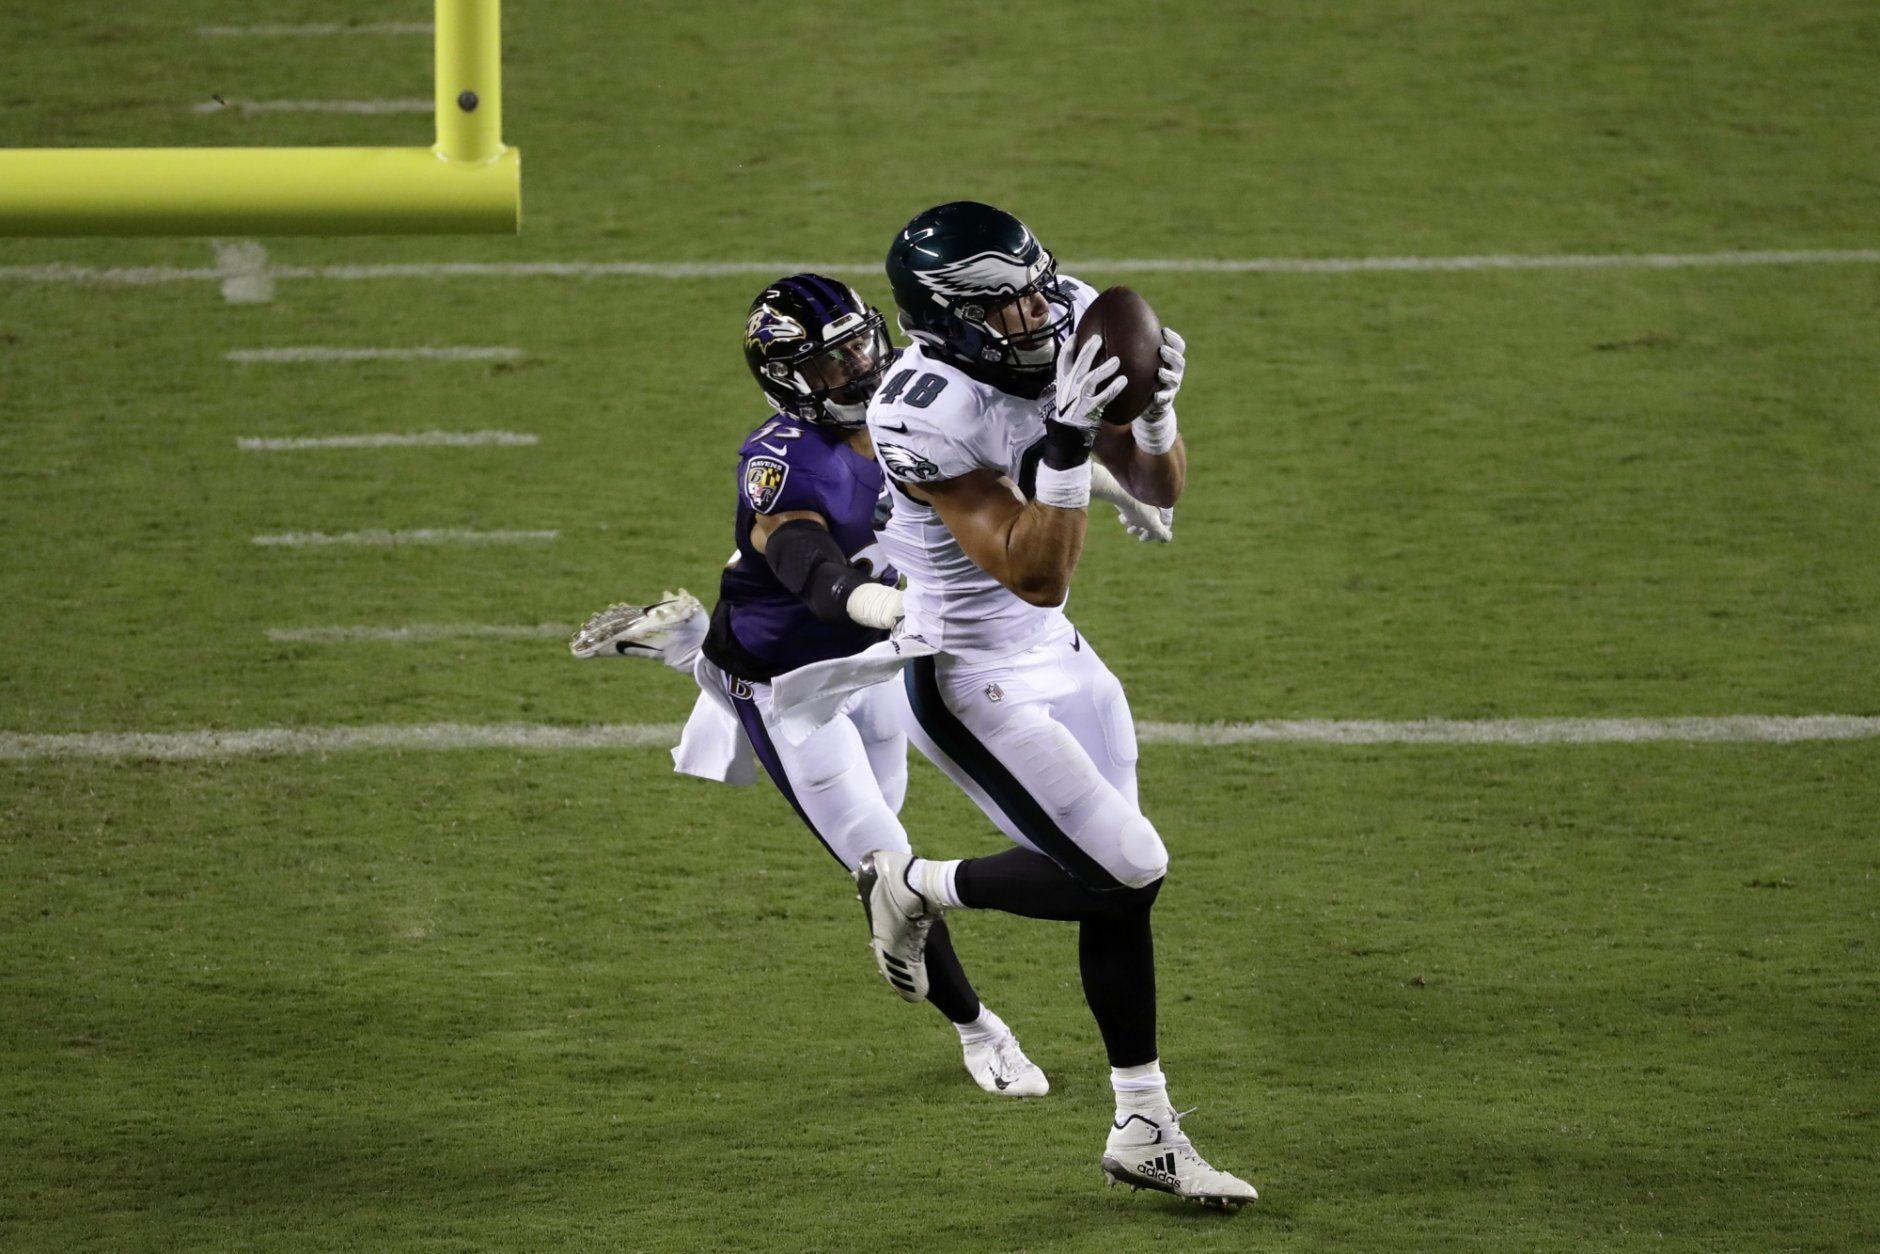 Philadelphia Eagles' Alex Ellis, right, catches a touchdown pass against Baltimore Ravens' Bennett Jackson (33) during the second half of a preseason NFL football game Thursday, Aug. 22, 2019, in Philadelphia. (AP Photo/Michael Perez)